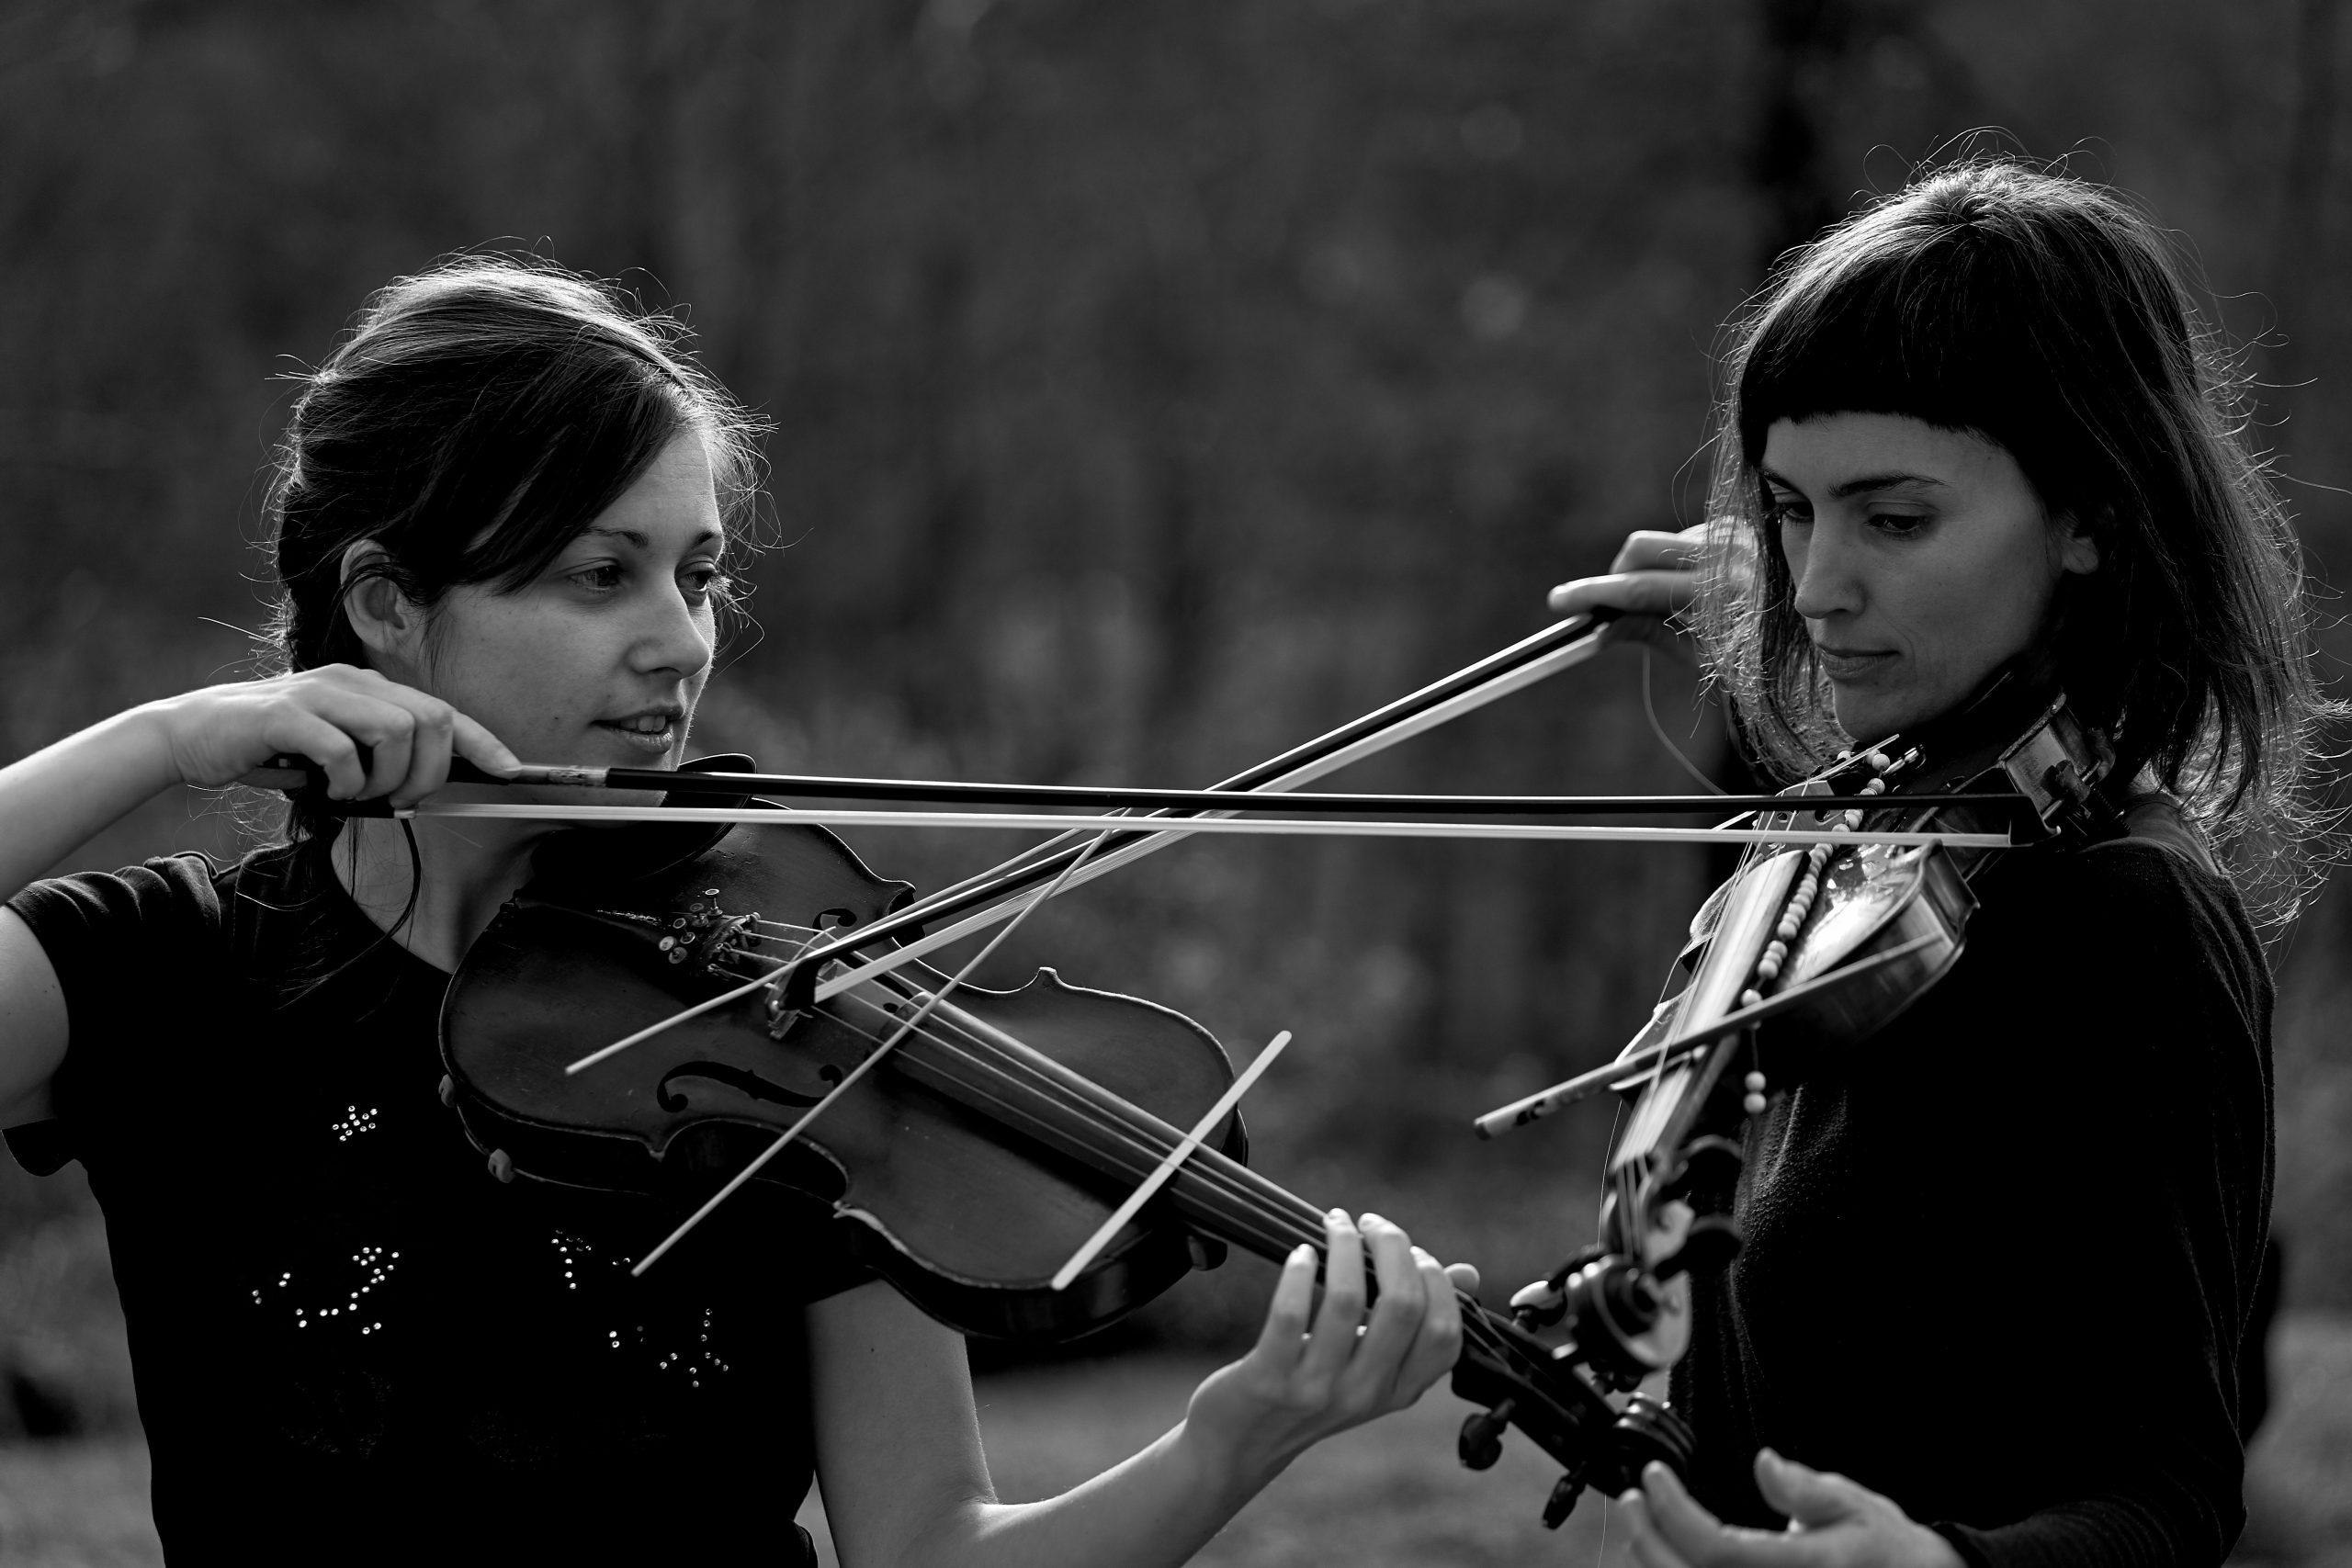 Interpenetration: Rinus van Alebeek -|- Ana Kravanja & Tijana Stanković